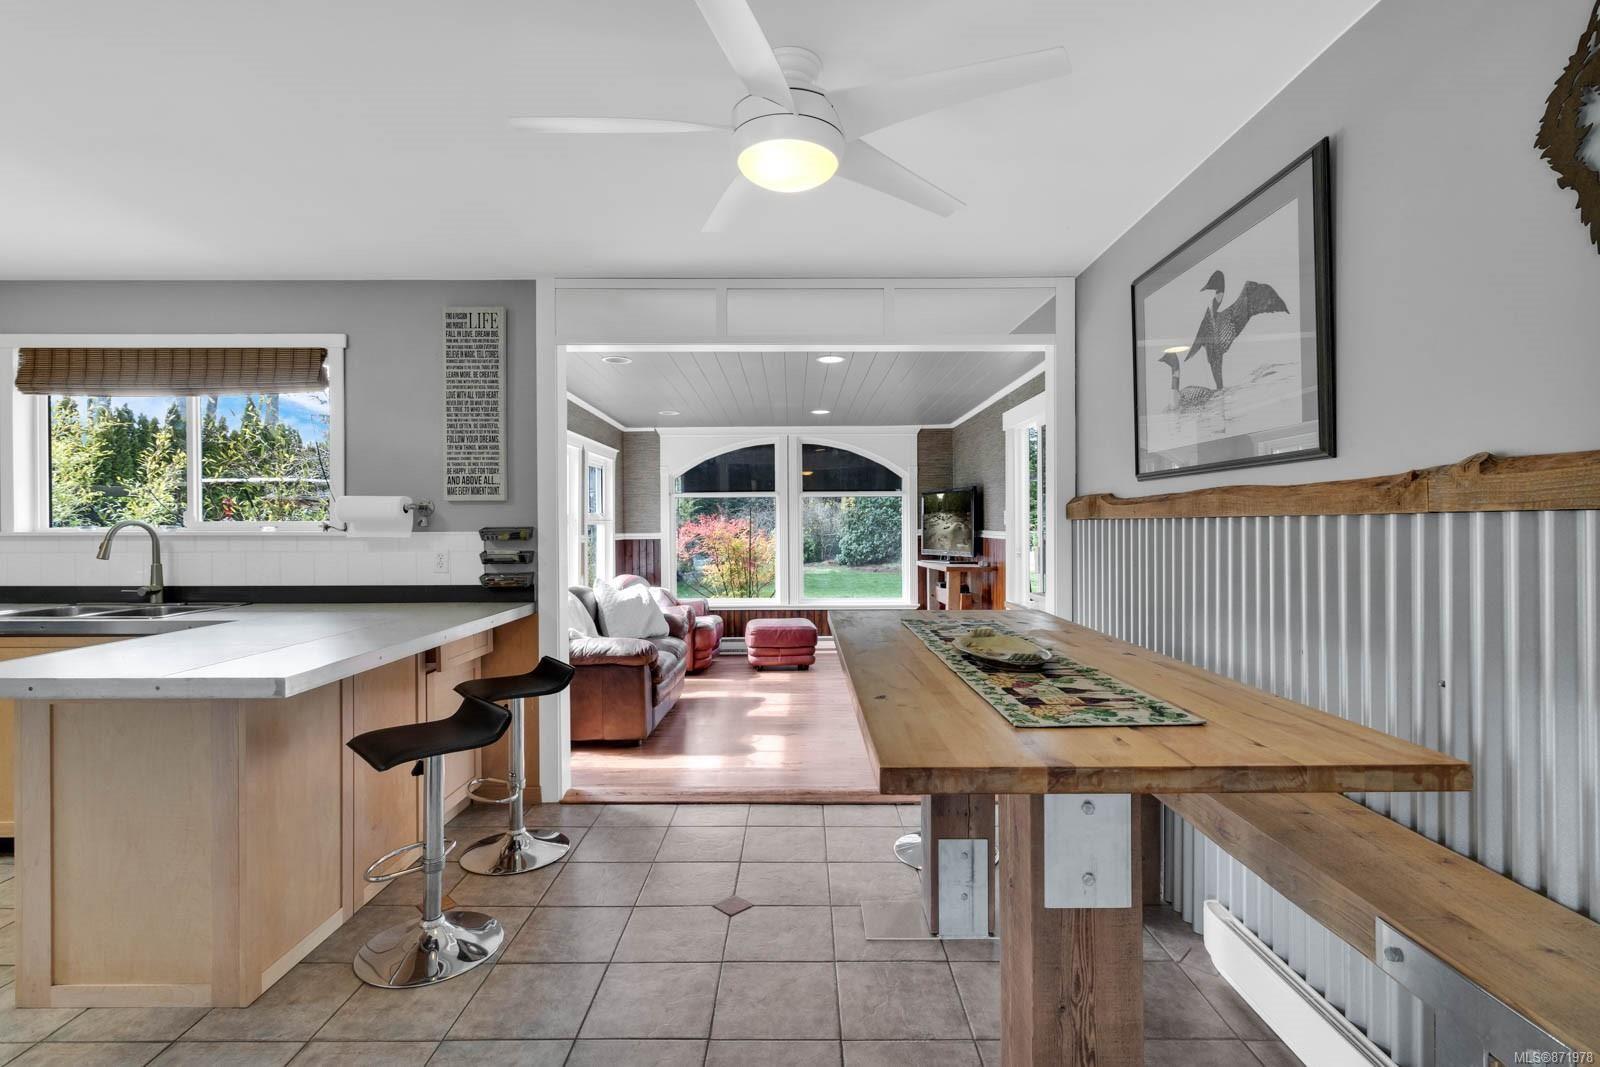 Photo 5: Photos: 1539 Chilcotin Cres in : CV Comox (Town of) House for sale (Comox Valley)  : MLS®# 871978